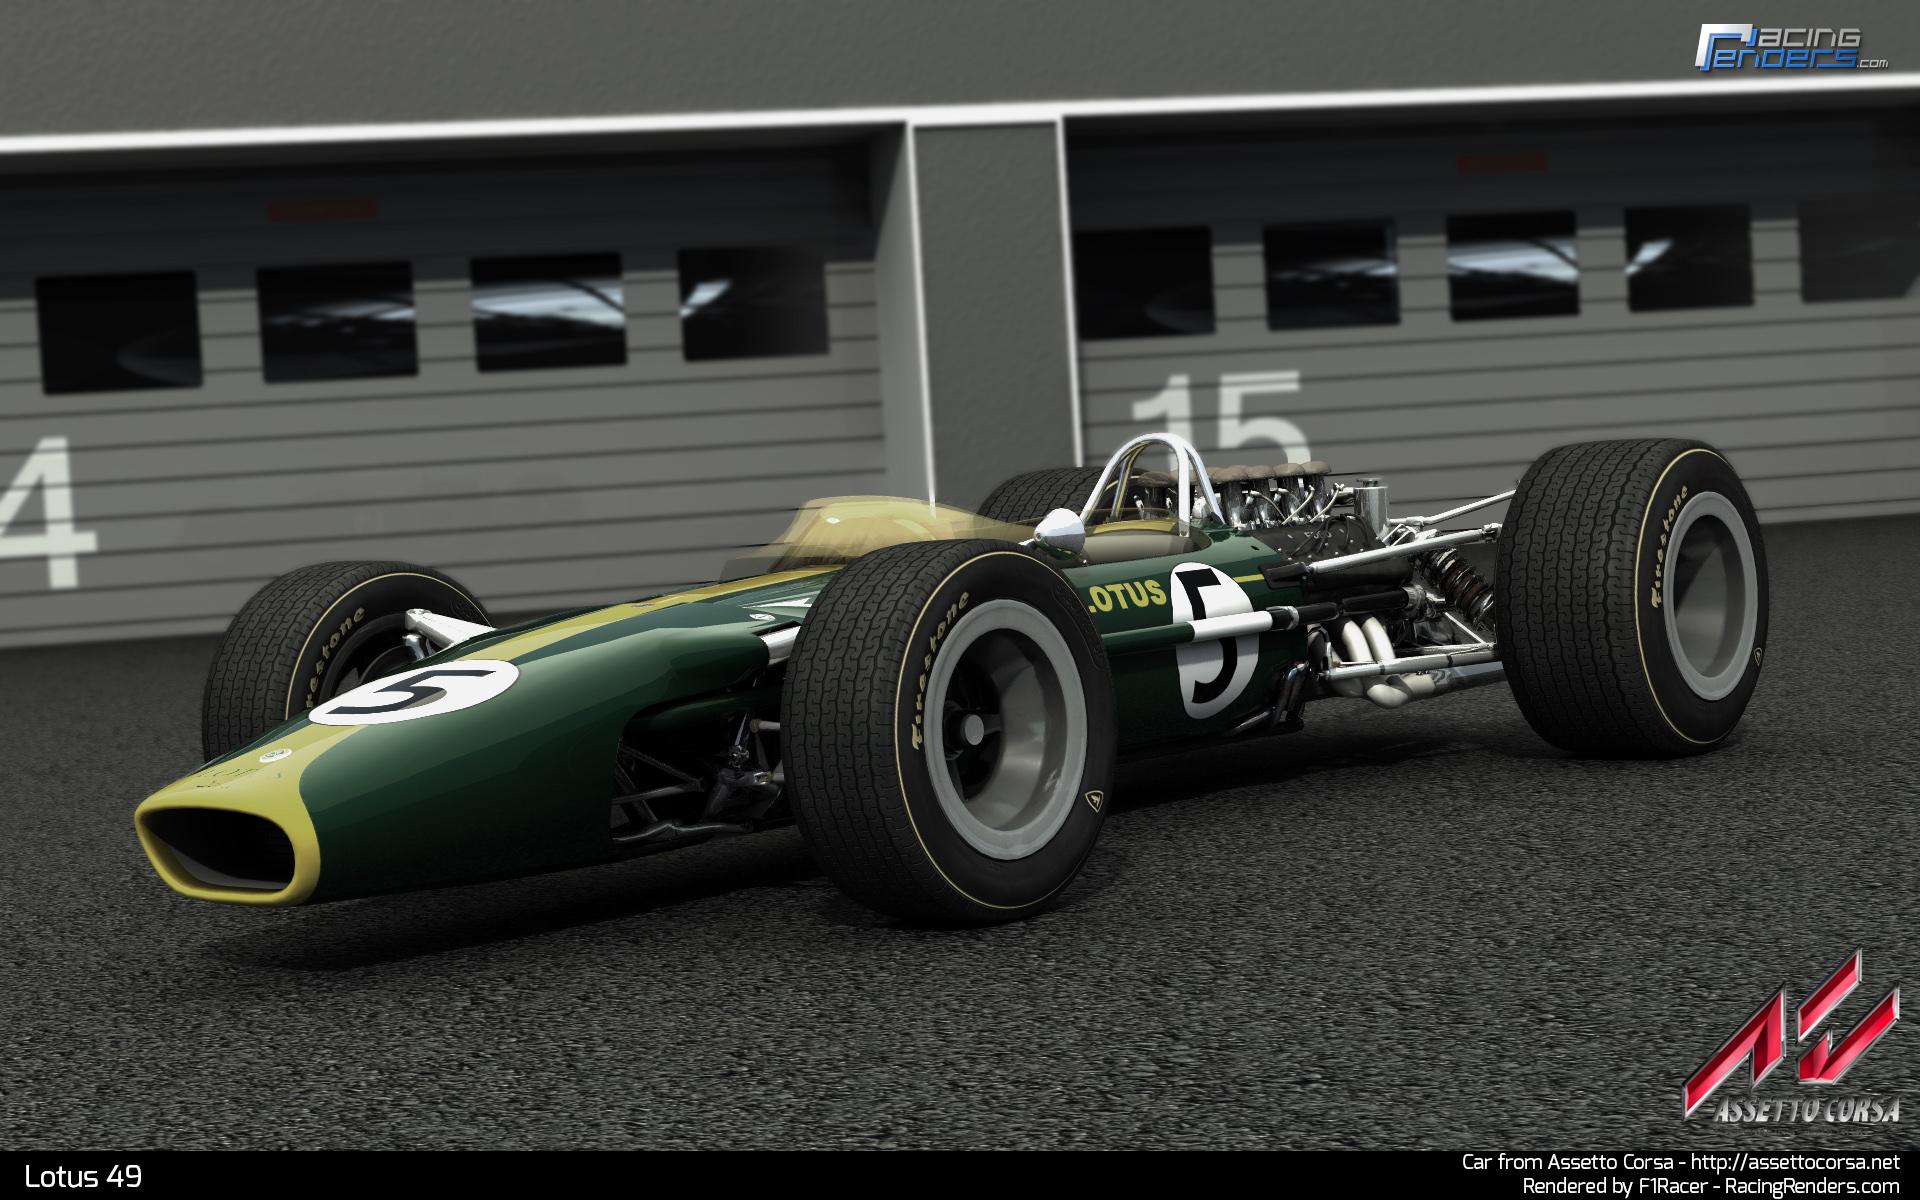 assetto corsa lotus 49 renders sim racing news. Black Bedroom Furniture Sets. Home Design Ideas